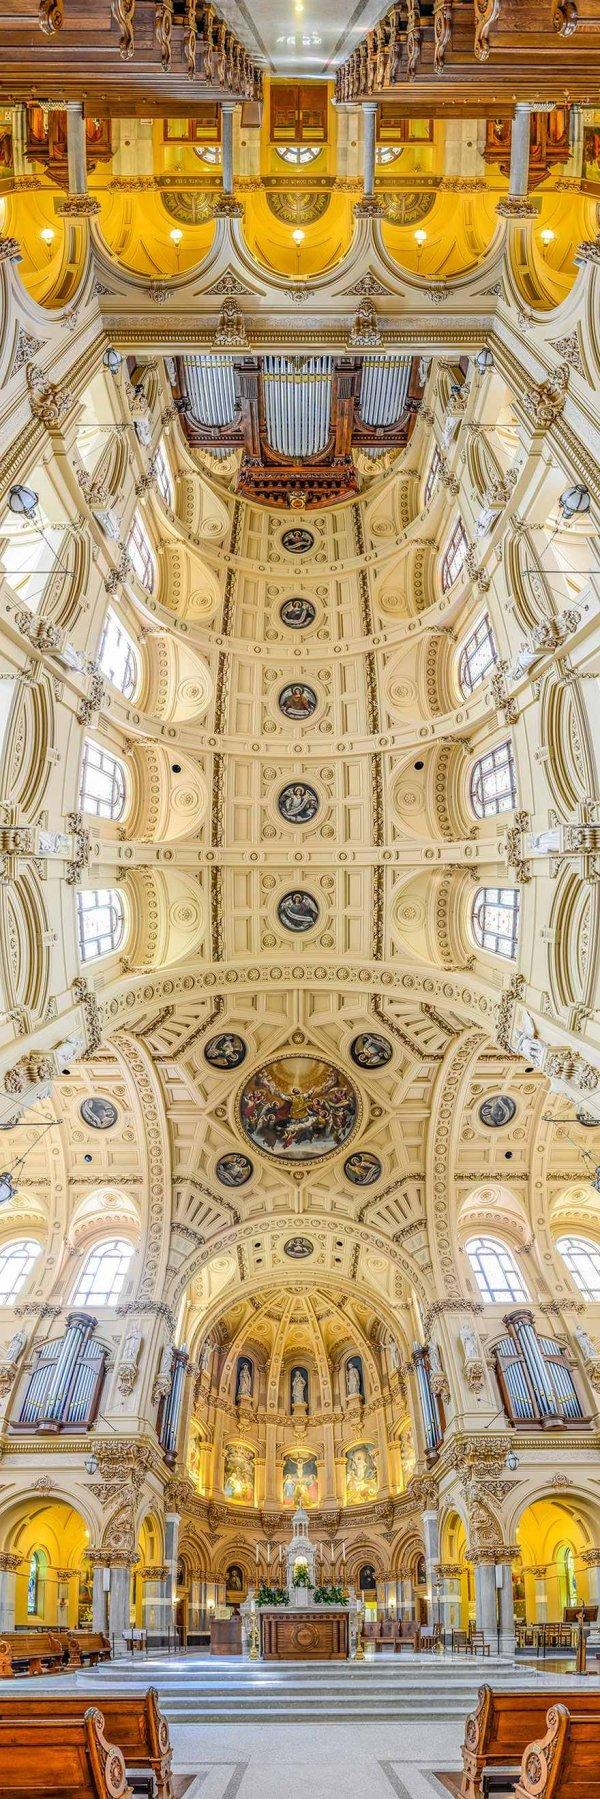 Церковная архитектура в панорамных снимках Ричарда Силвера (7 фото)